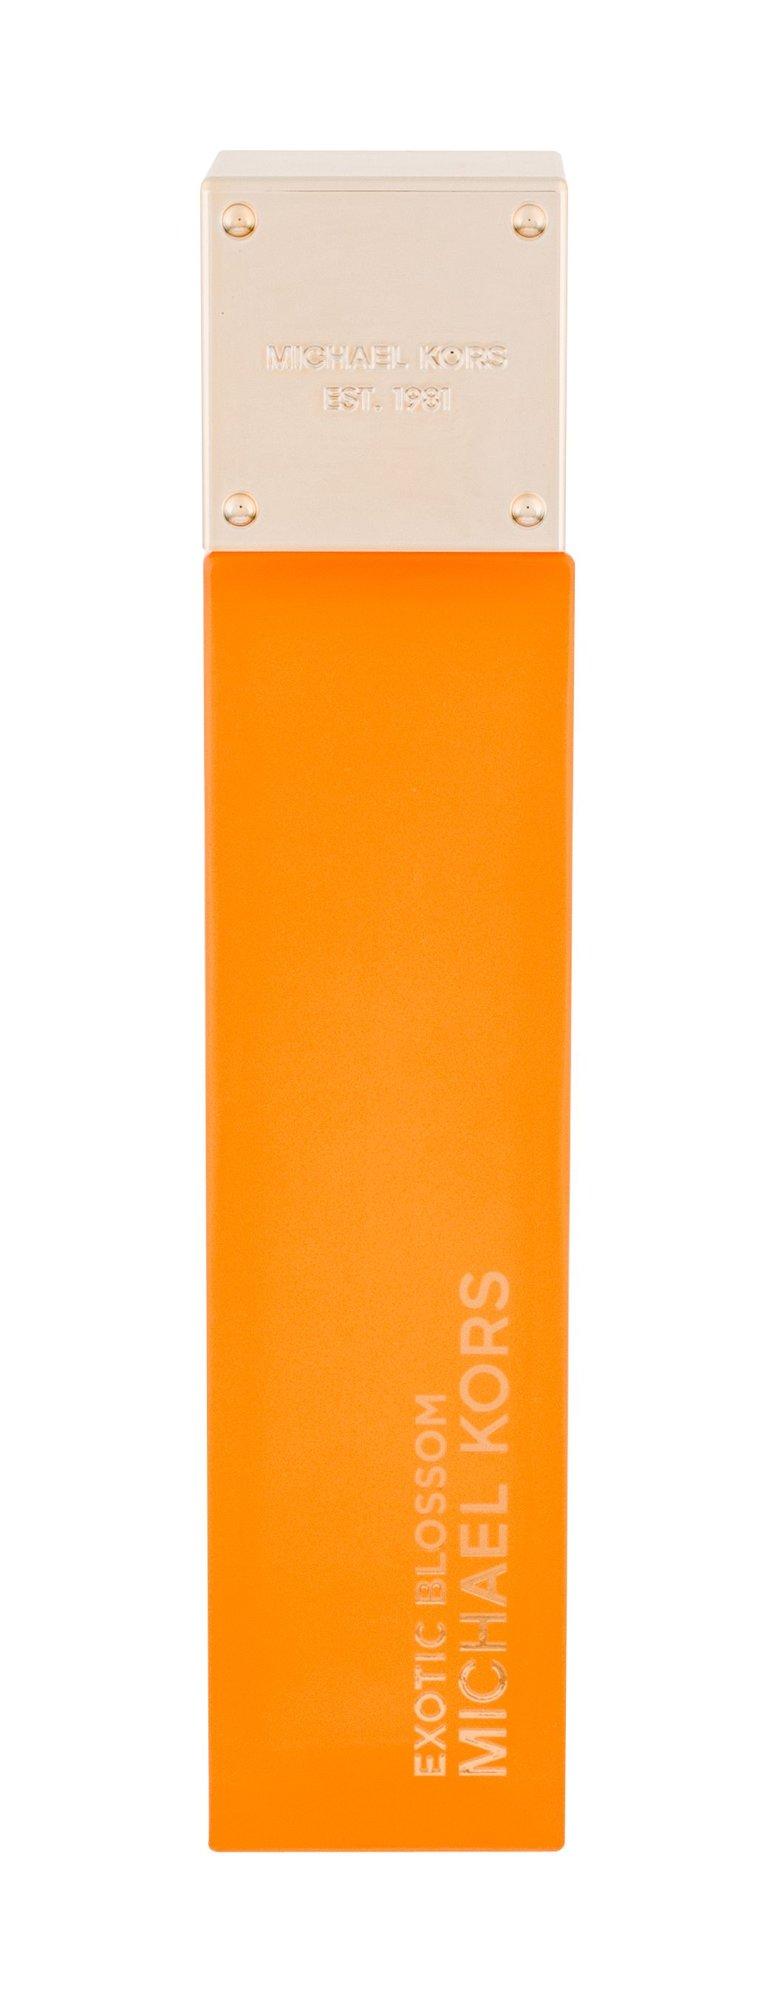 Michael Kors Exotic Blossom Eau de Parfum 100ml